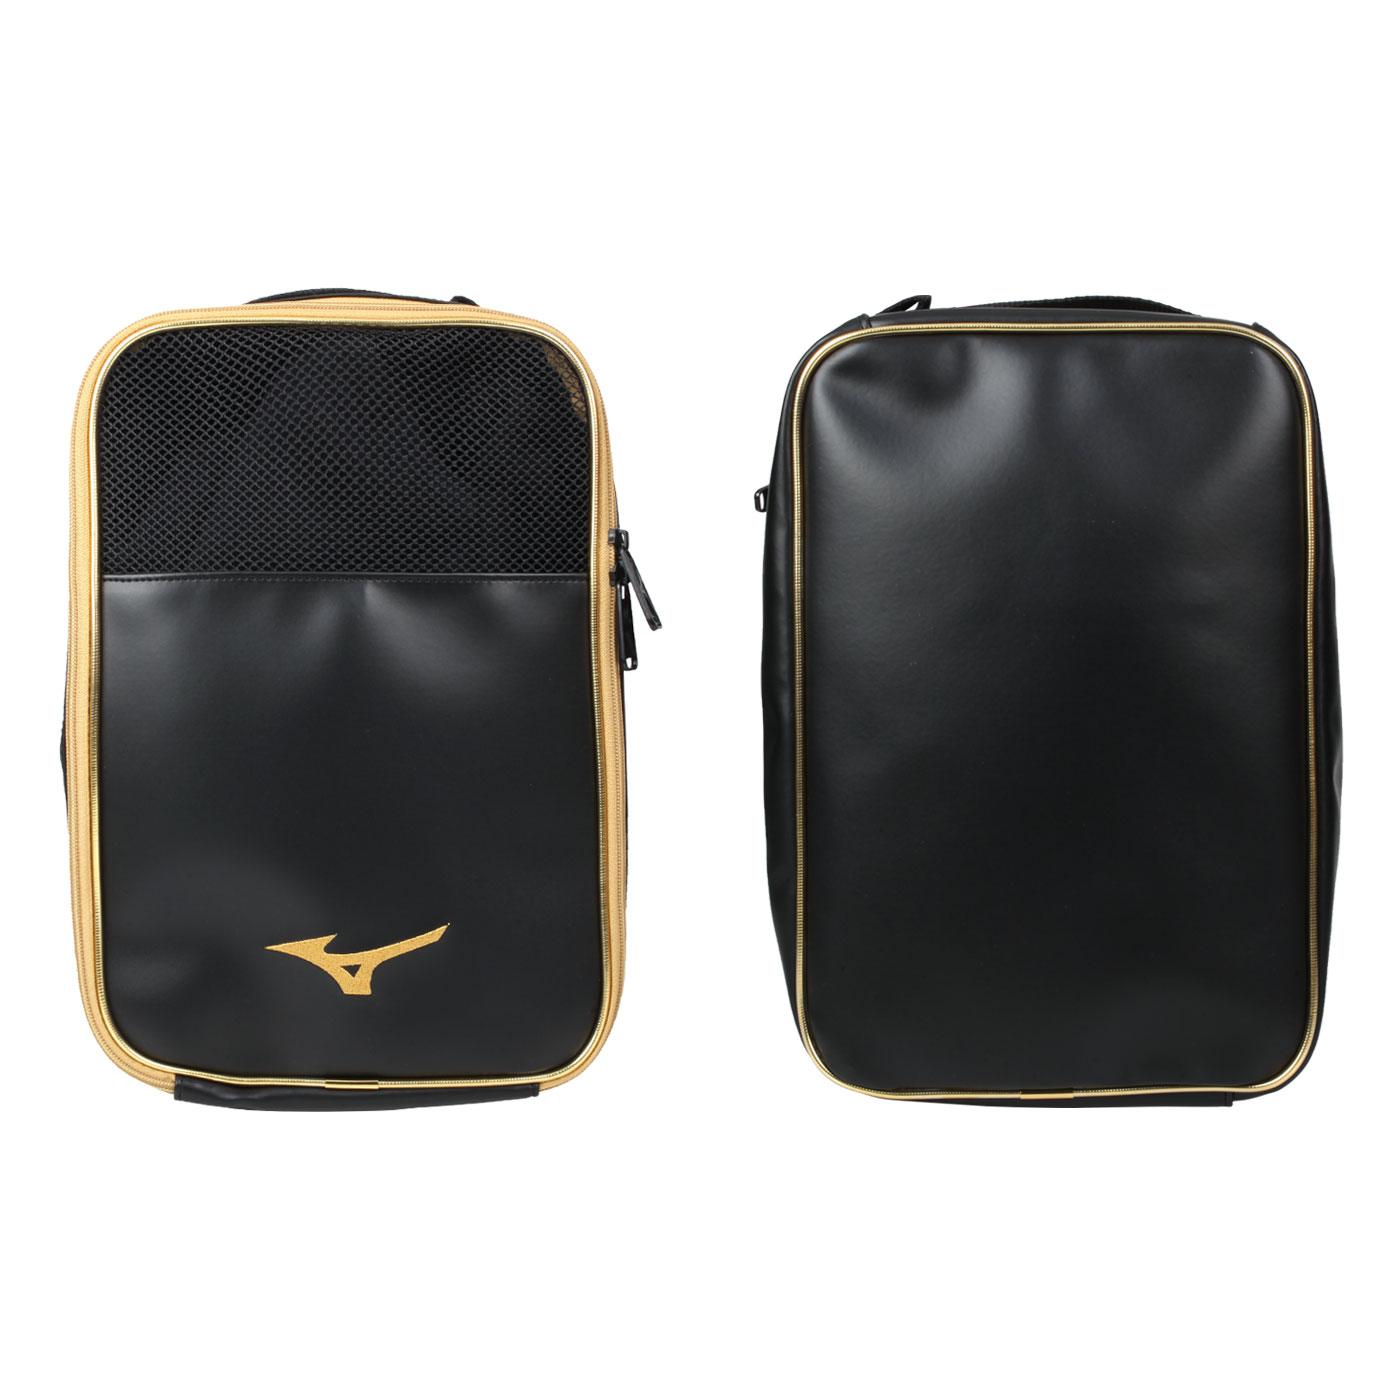 MIZUNO 鞋袋 33TM120109 - 黑金